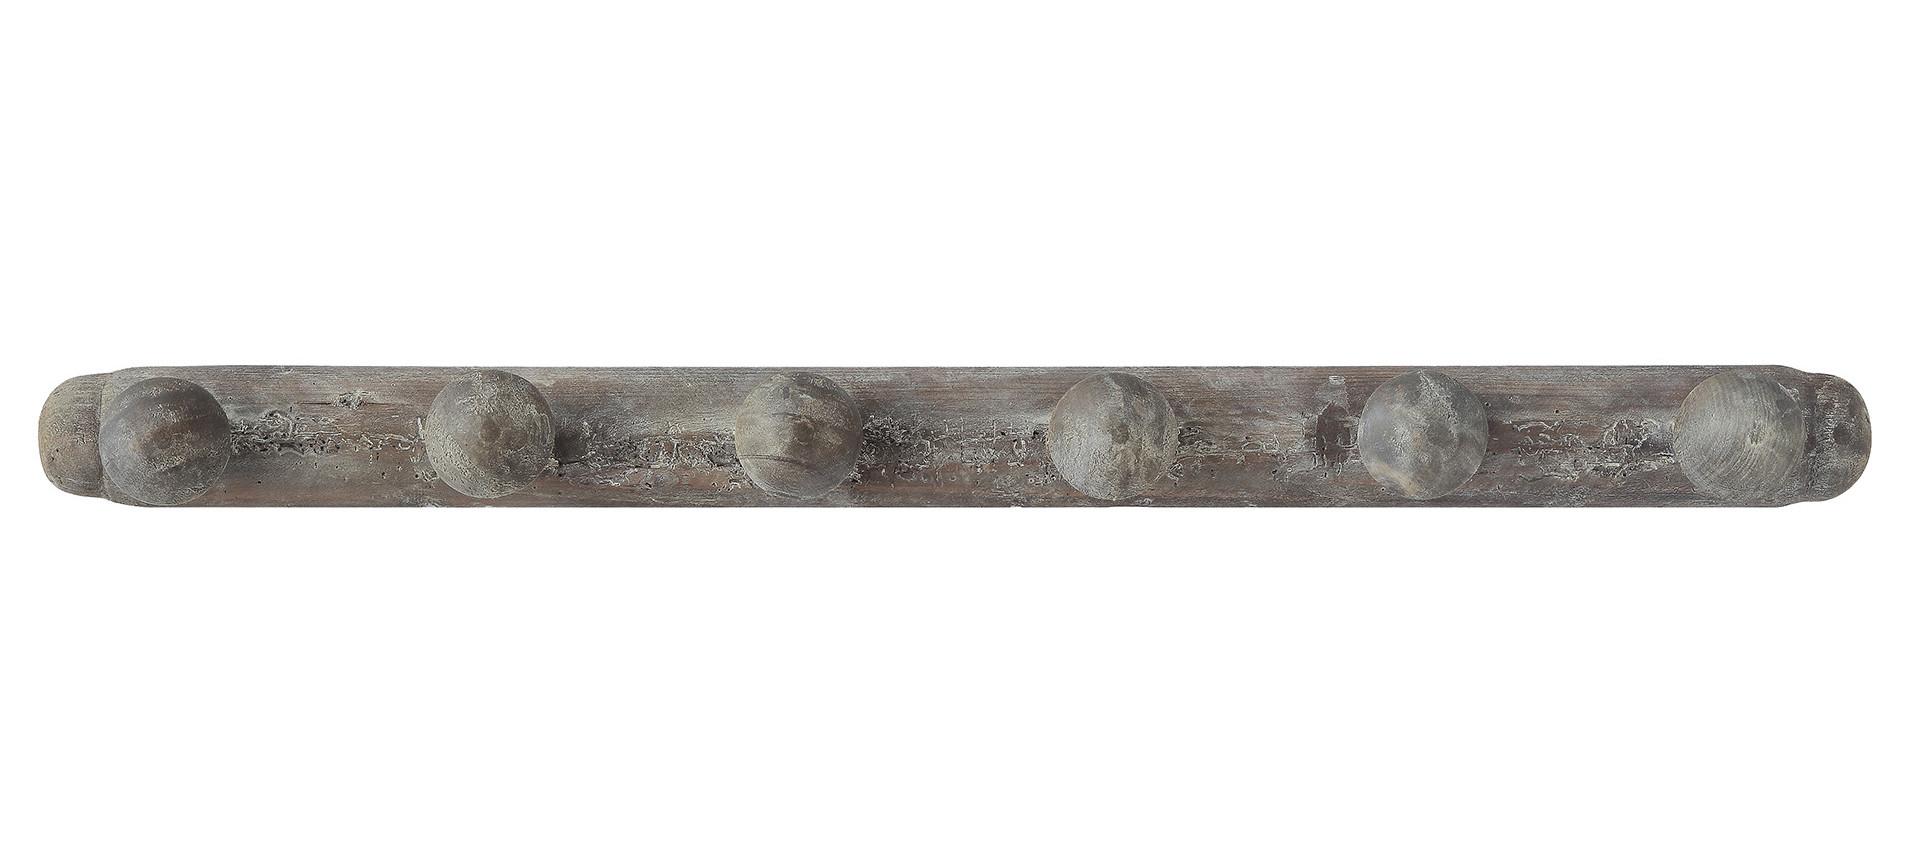 Hakenleiste Aus Holz Mit 6 Haken